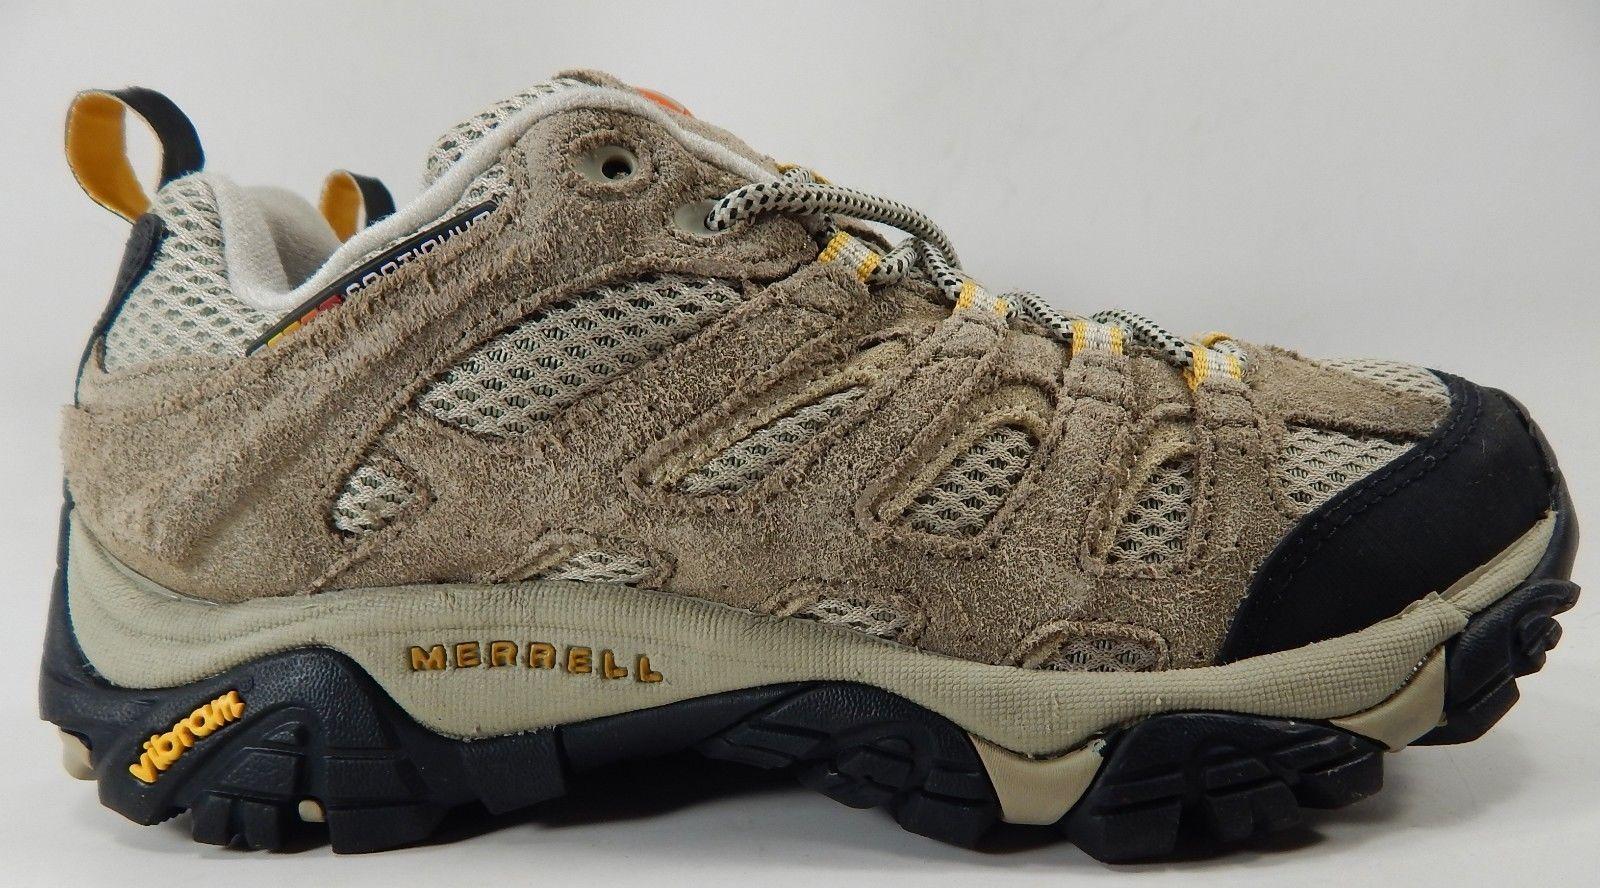 Merrell Moab 2 Ventilator Size US 10 M (B) EU 41 Women's Hiking / Trail Shoes